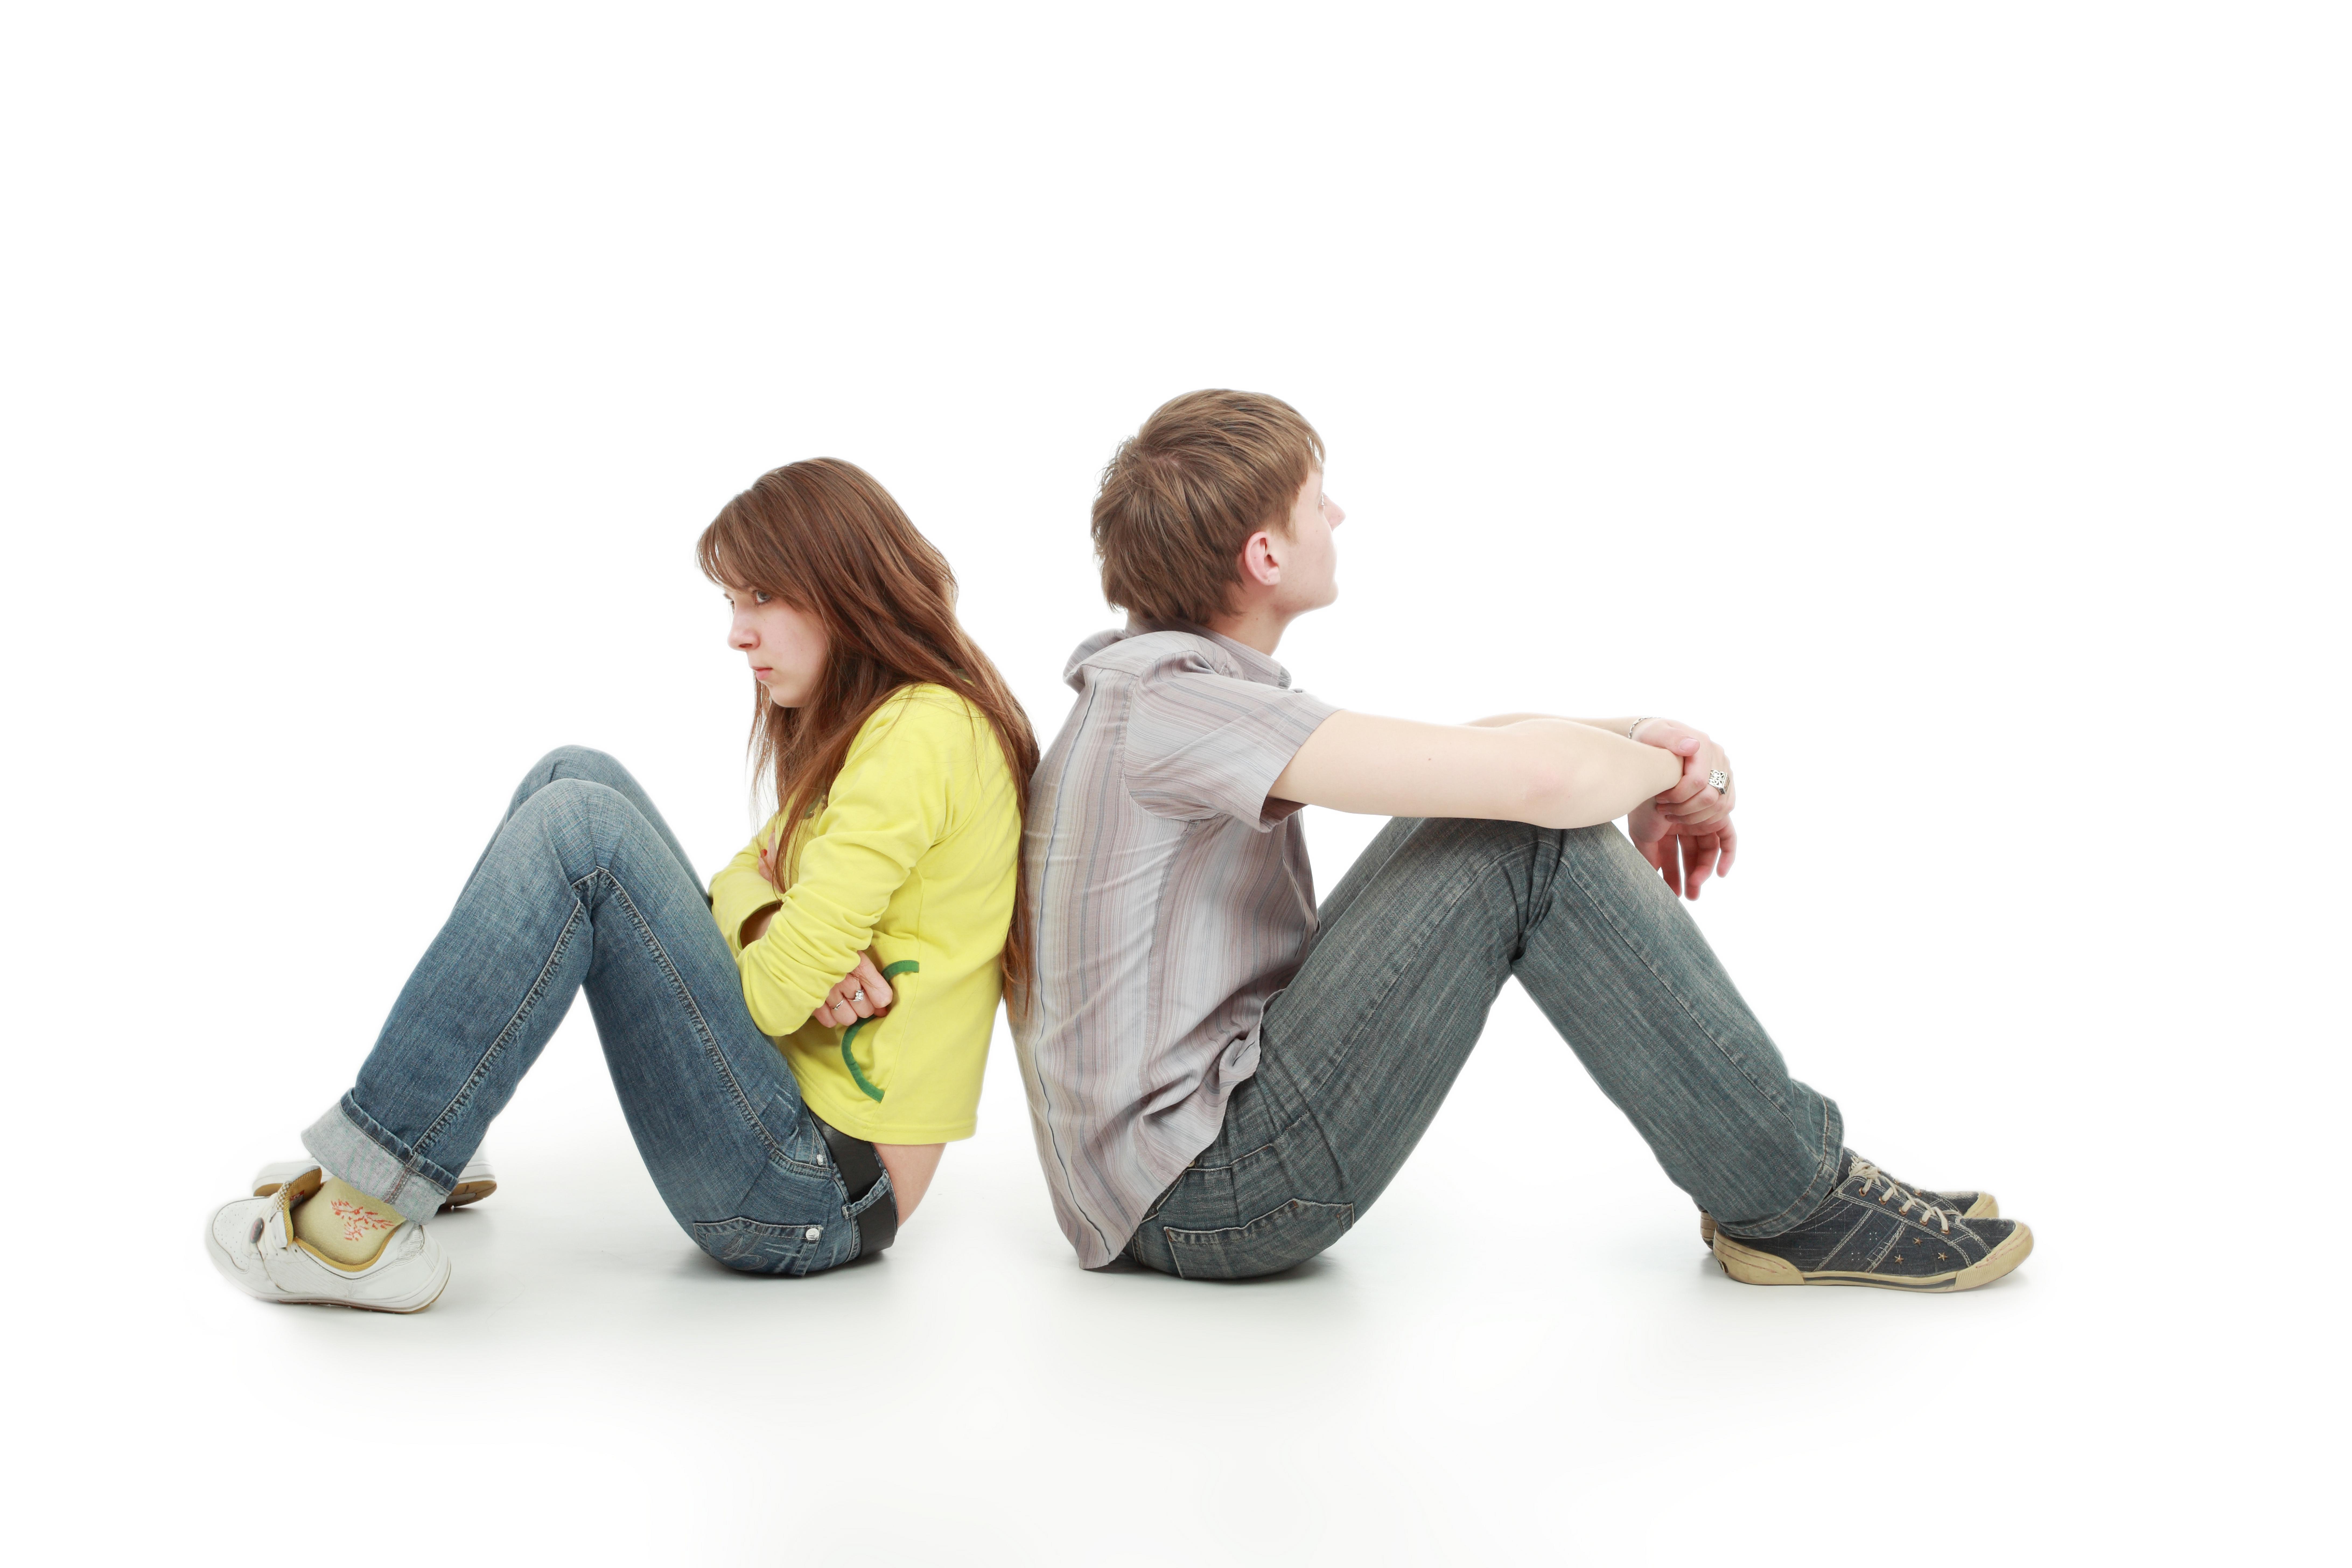 Confuzia comunicarii in cuplu, un obstacol greu de depasit